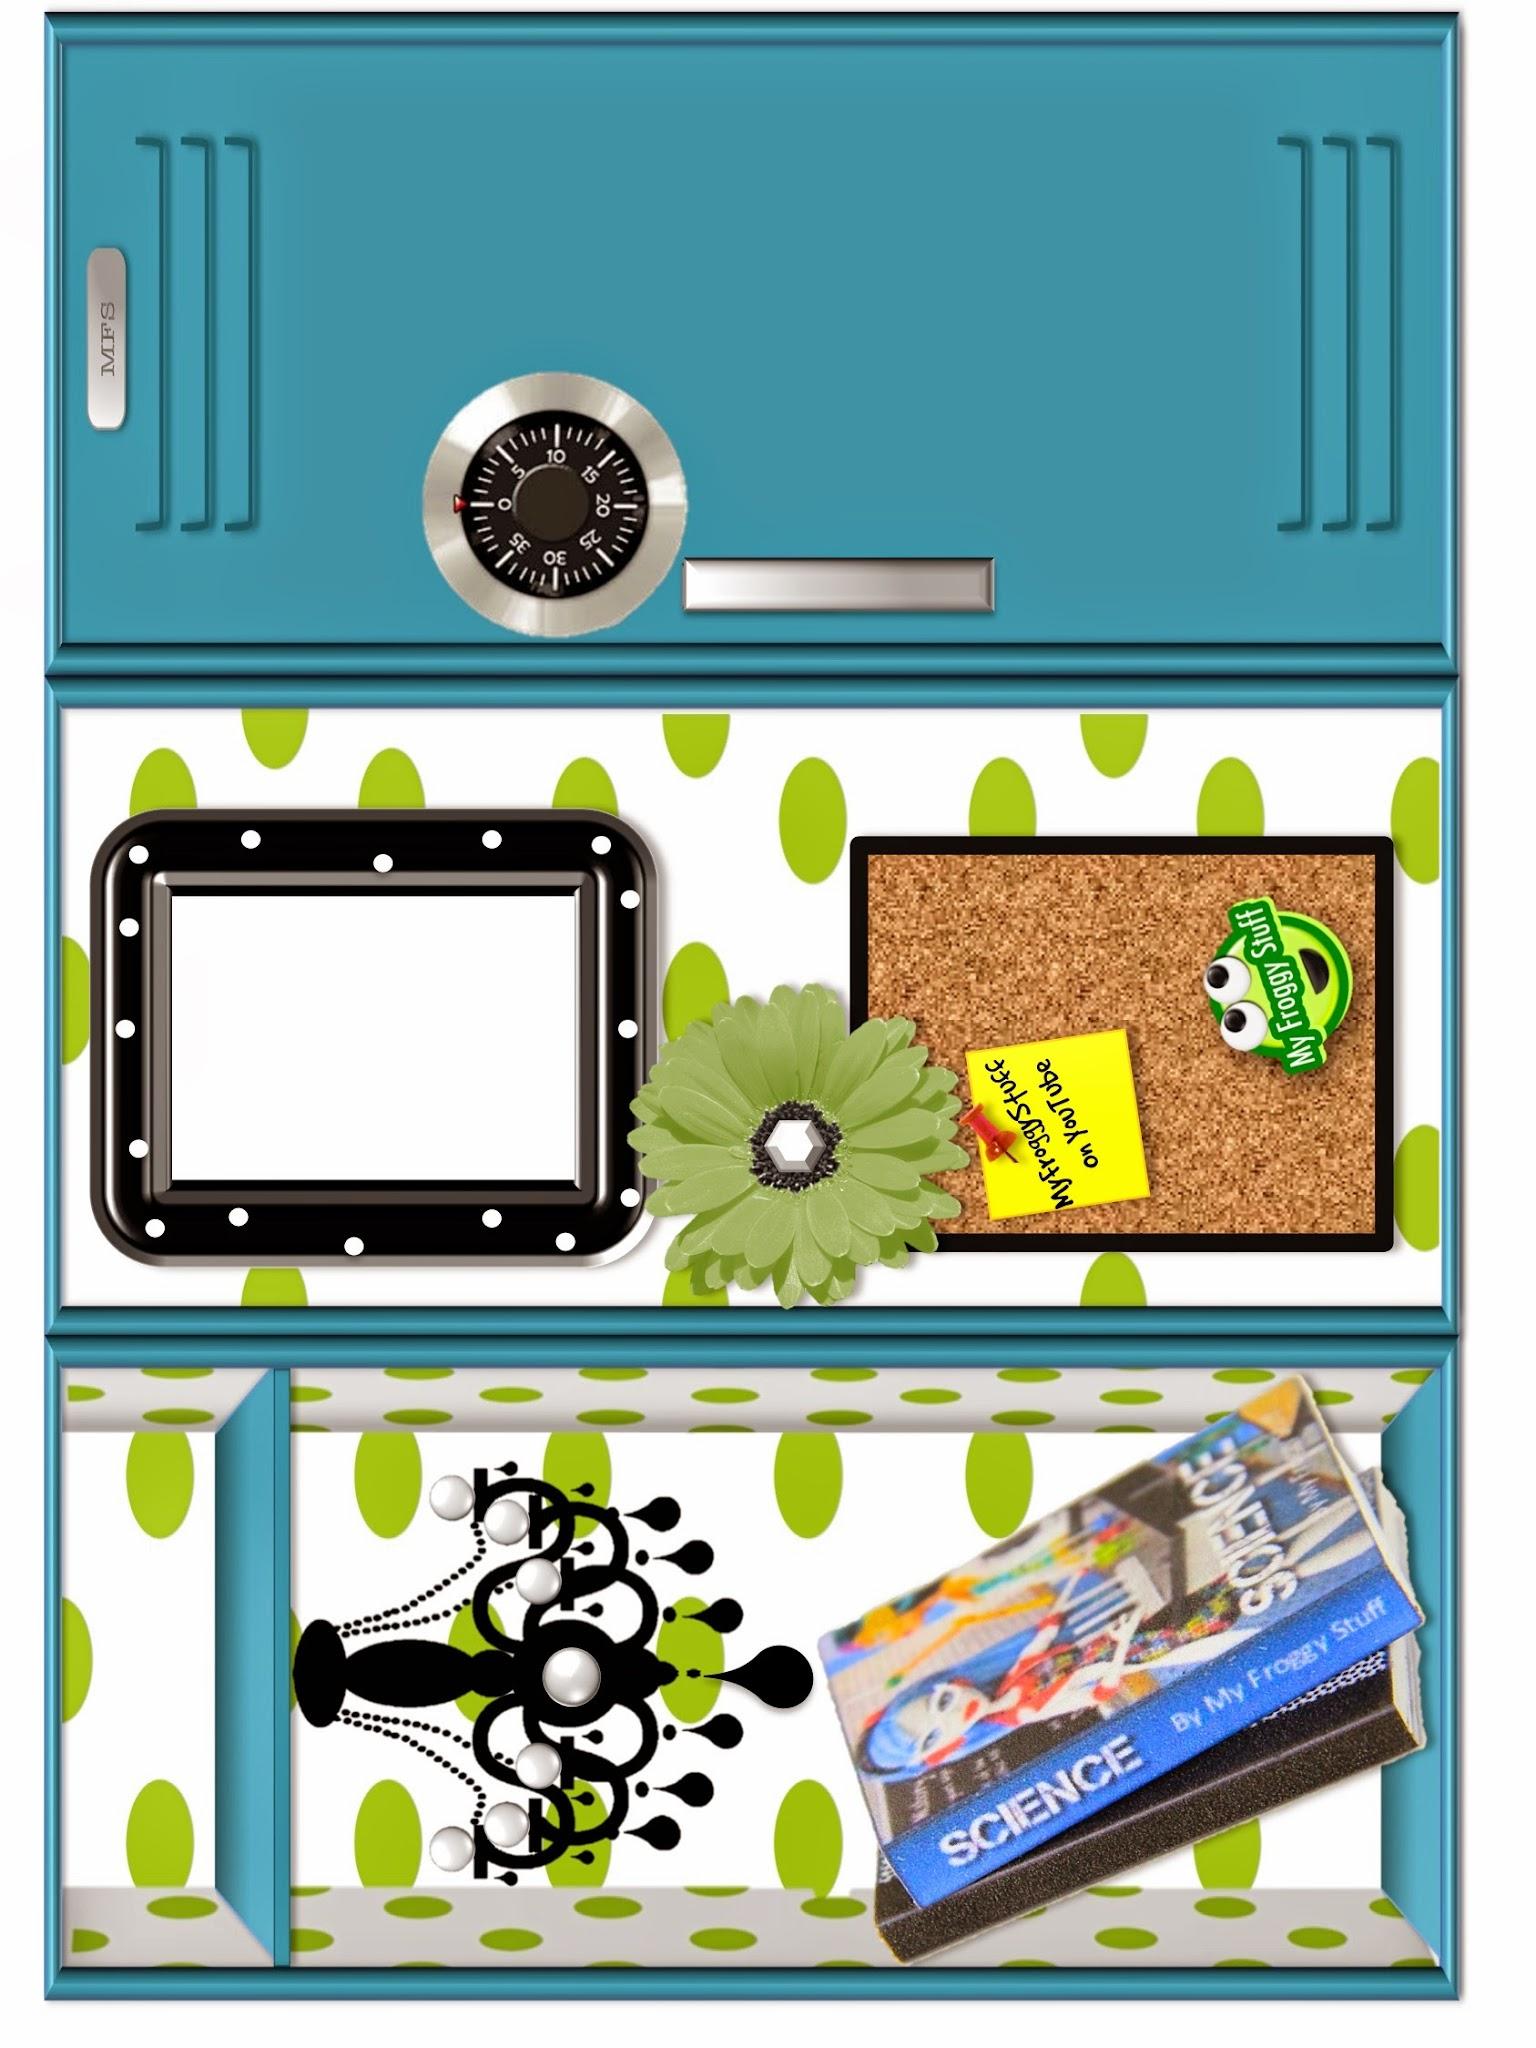 Myfroggystuff Blogspot Printables Worksheet Printable Worksheets And Activities For Teachers Parents Tutors And Homeschool Families